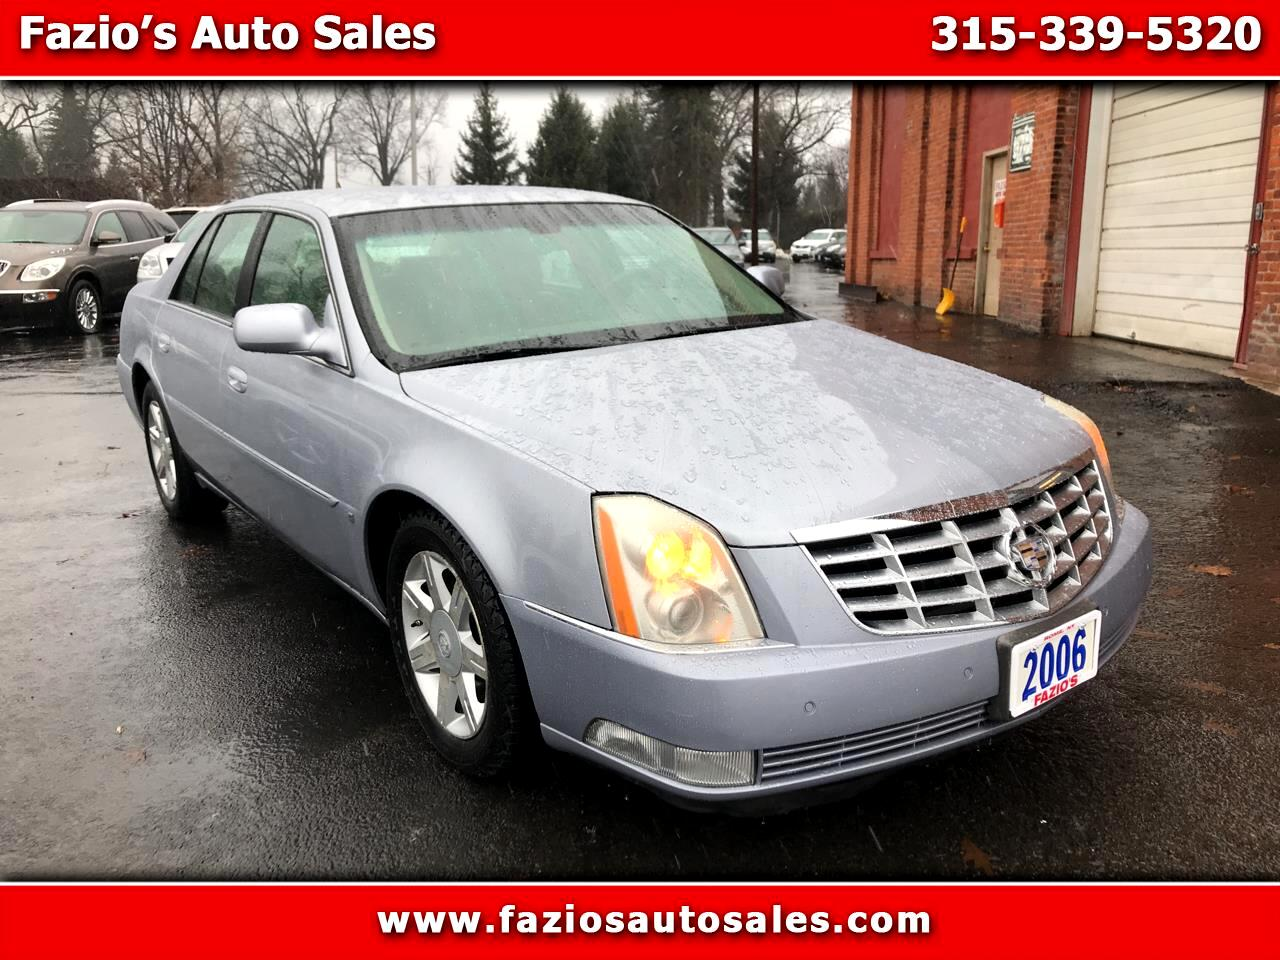 2006 Cadillac DTS 4dr Sdn Luxury I